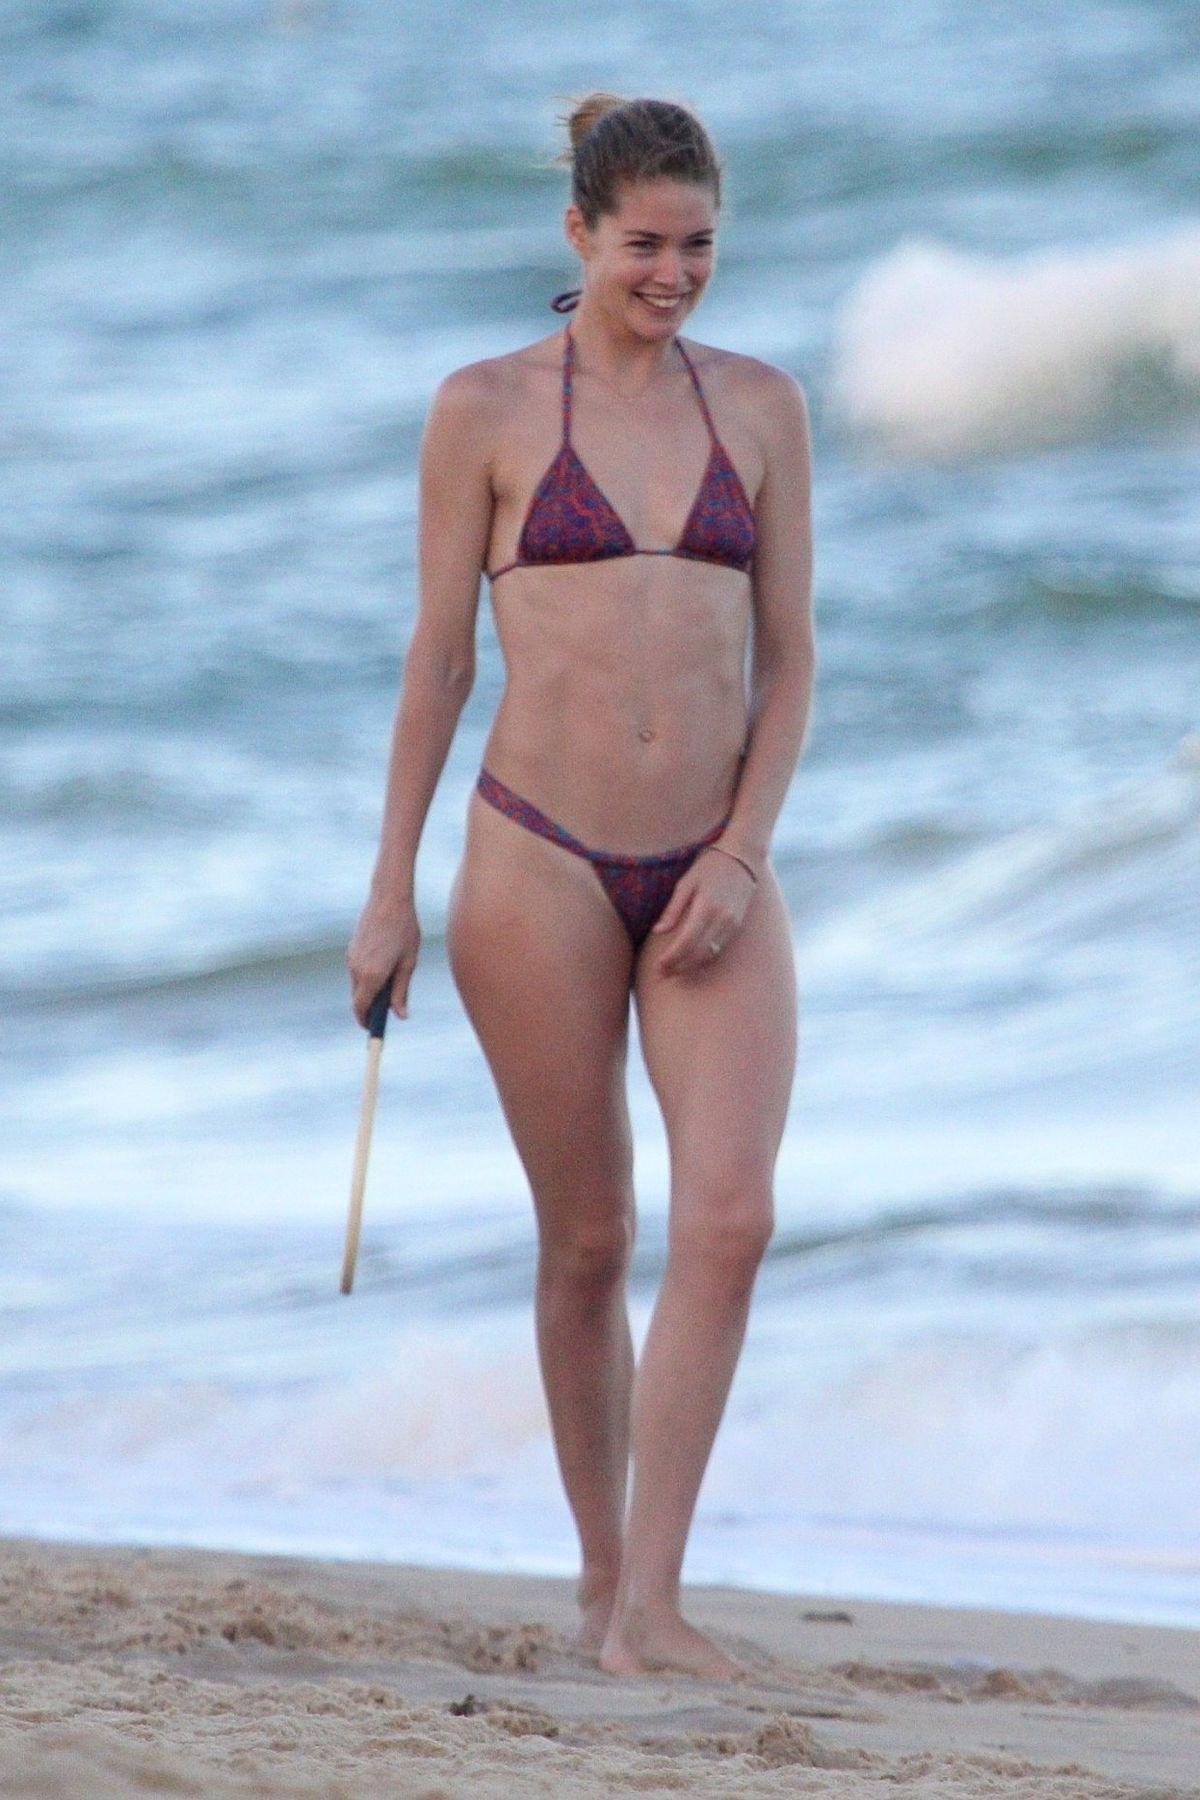 Candice Swanepoel and Doutzen Kroes in Bikini at Espelho Beach in Bahia Pic 5 of 35